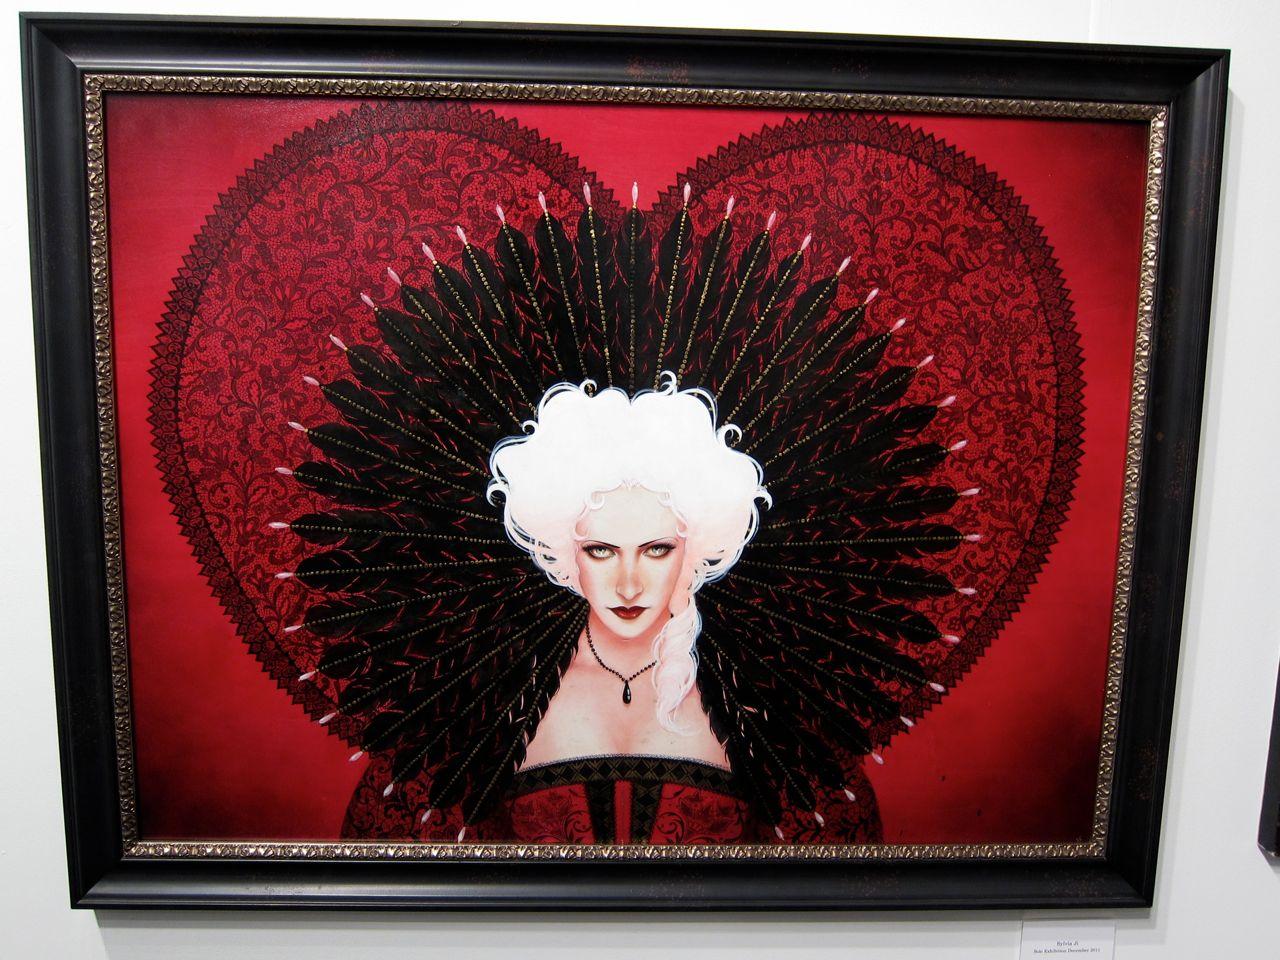 Scope Miami Corey Helford Gallery AM 13